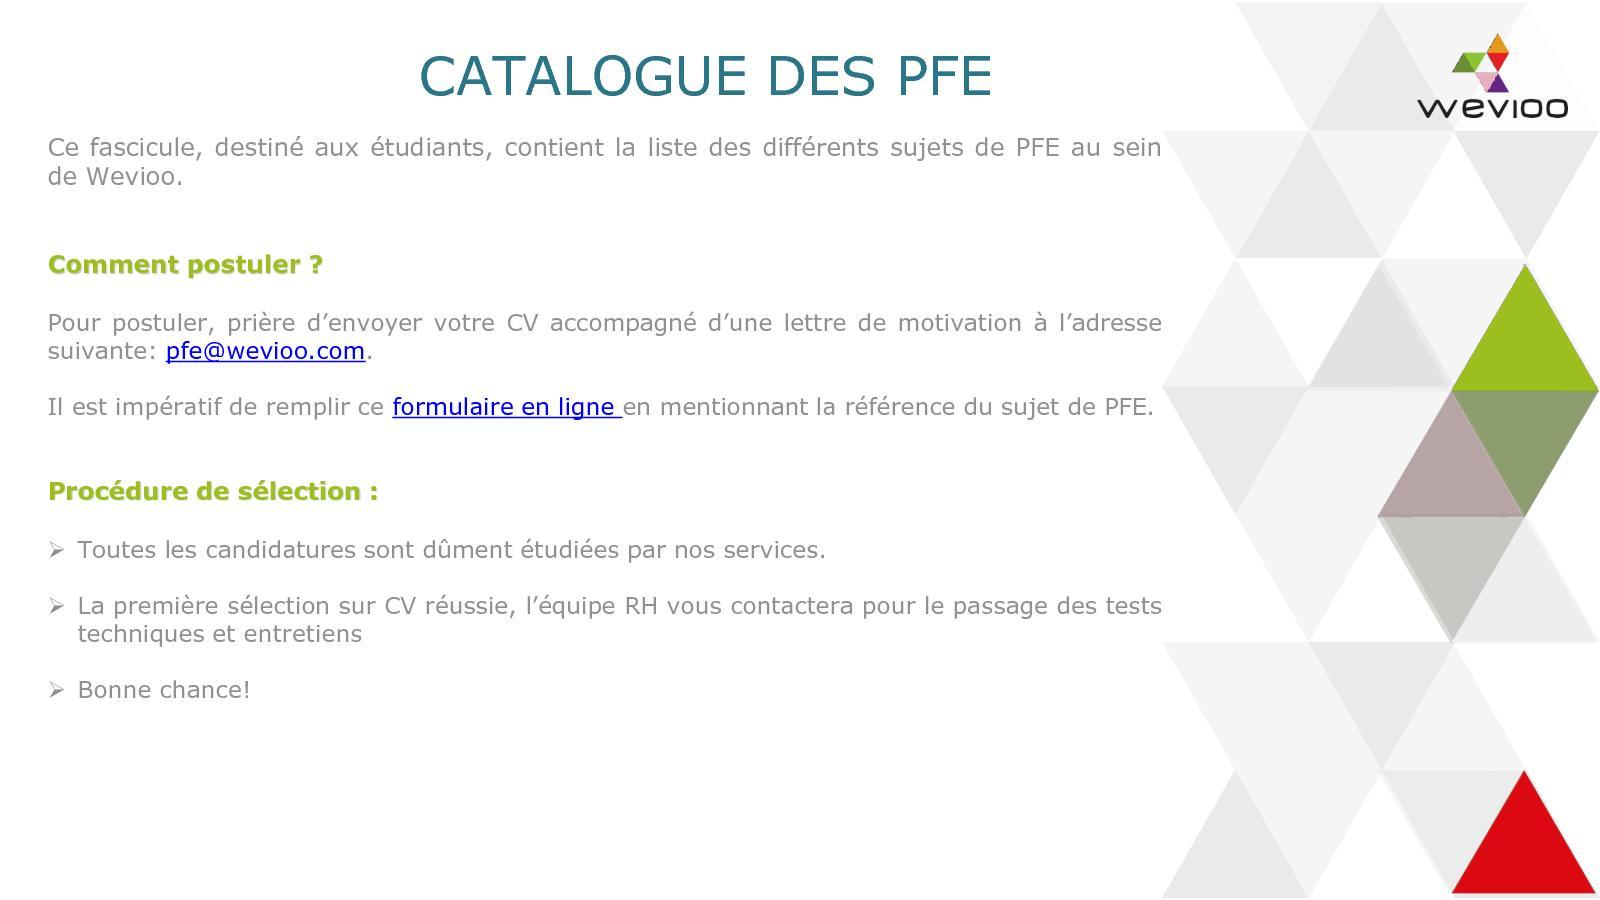 Catalogue Wevioo Pfe 2017 2018 Calameo Downloader